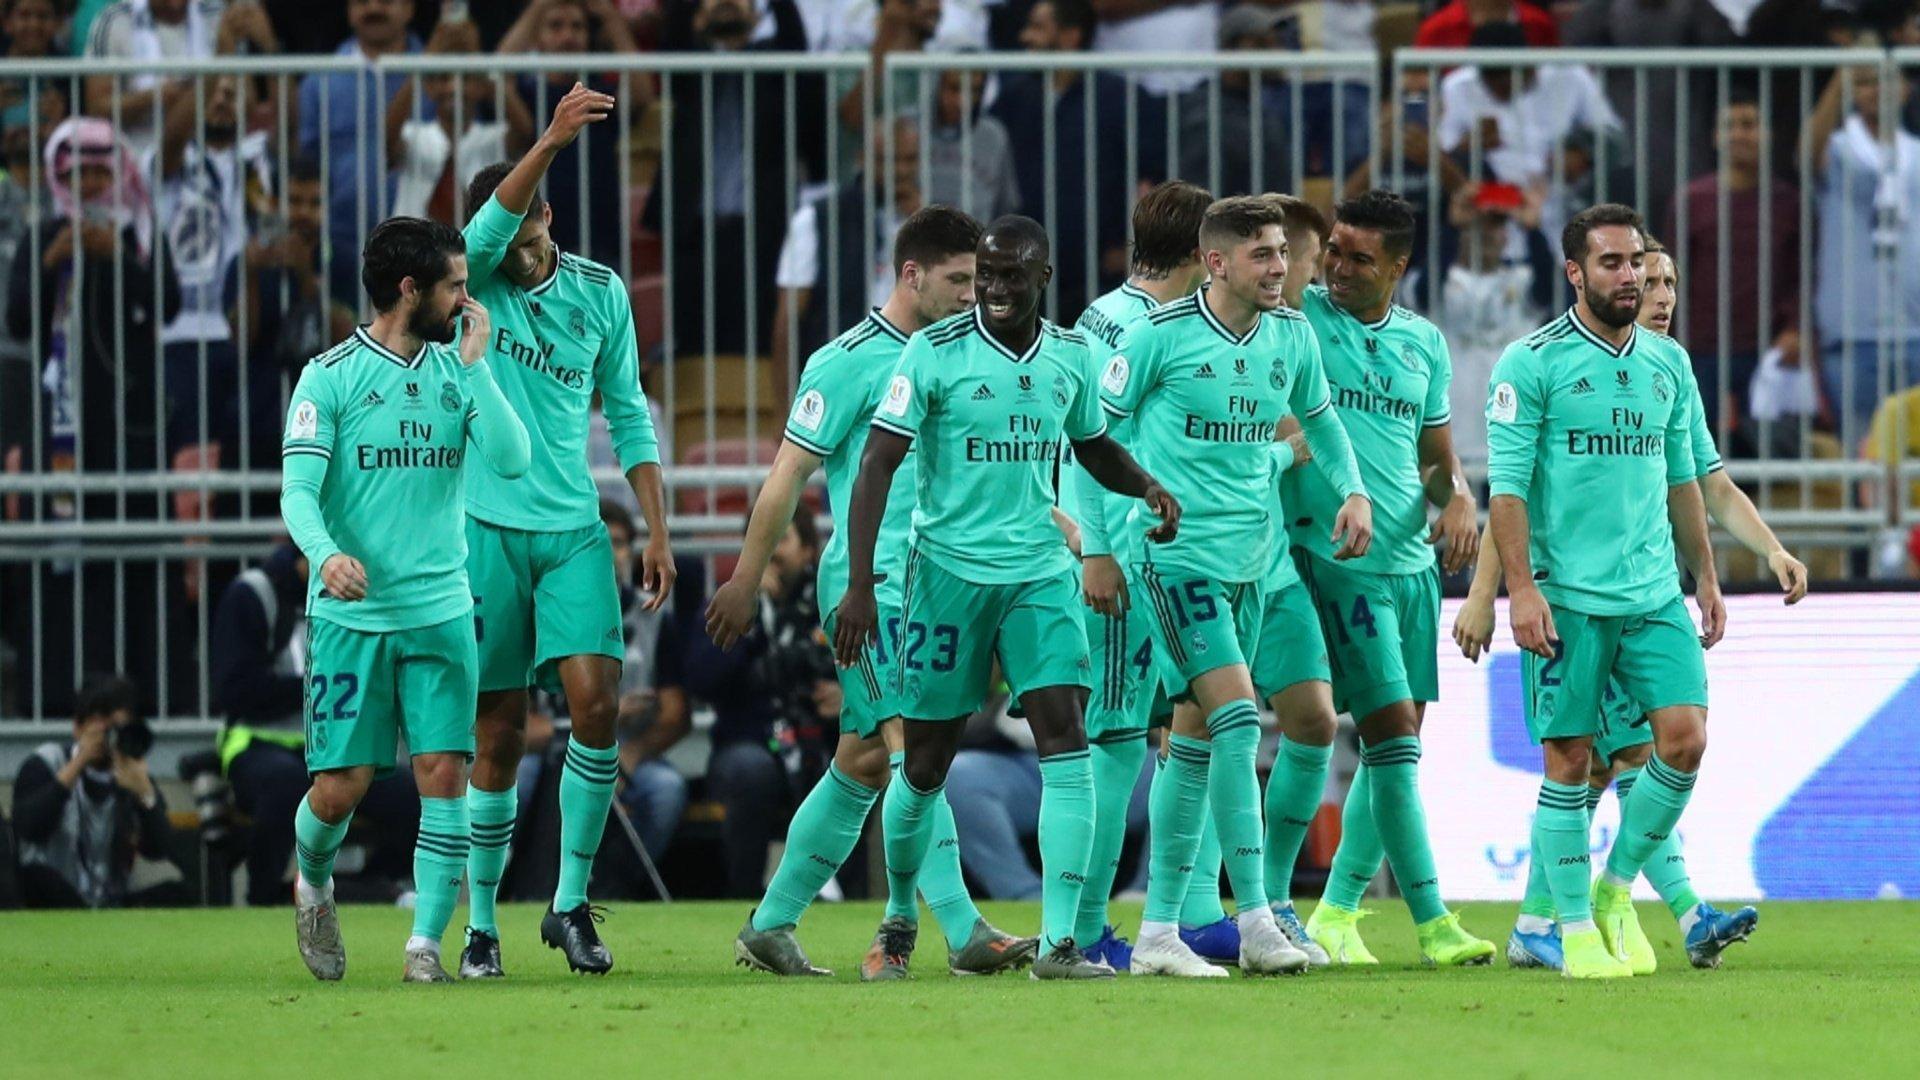 Report: Valencia 1-3 Real Madrid